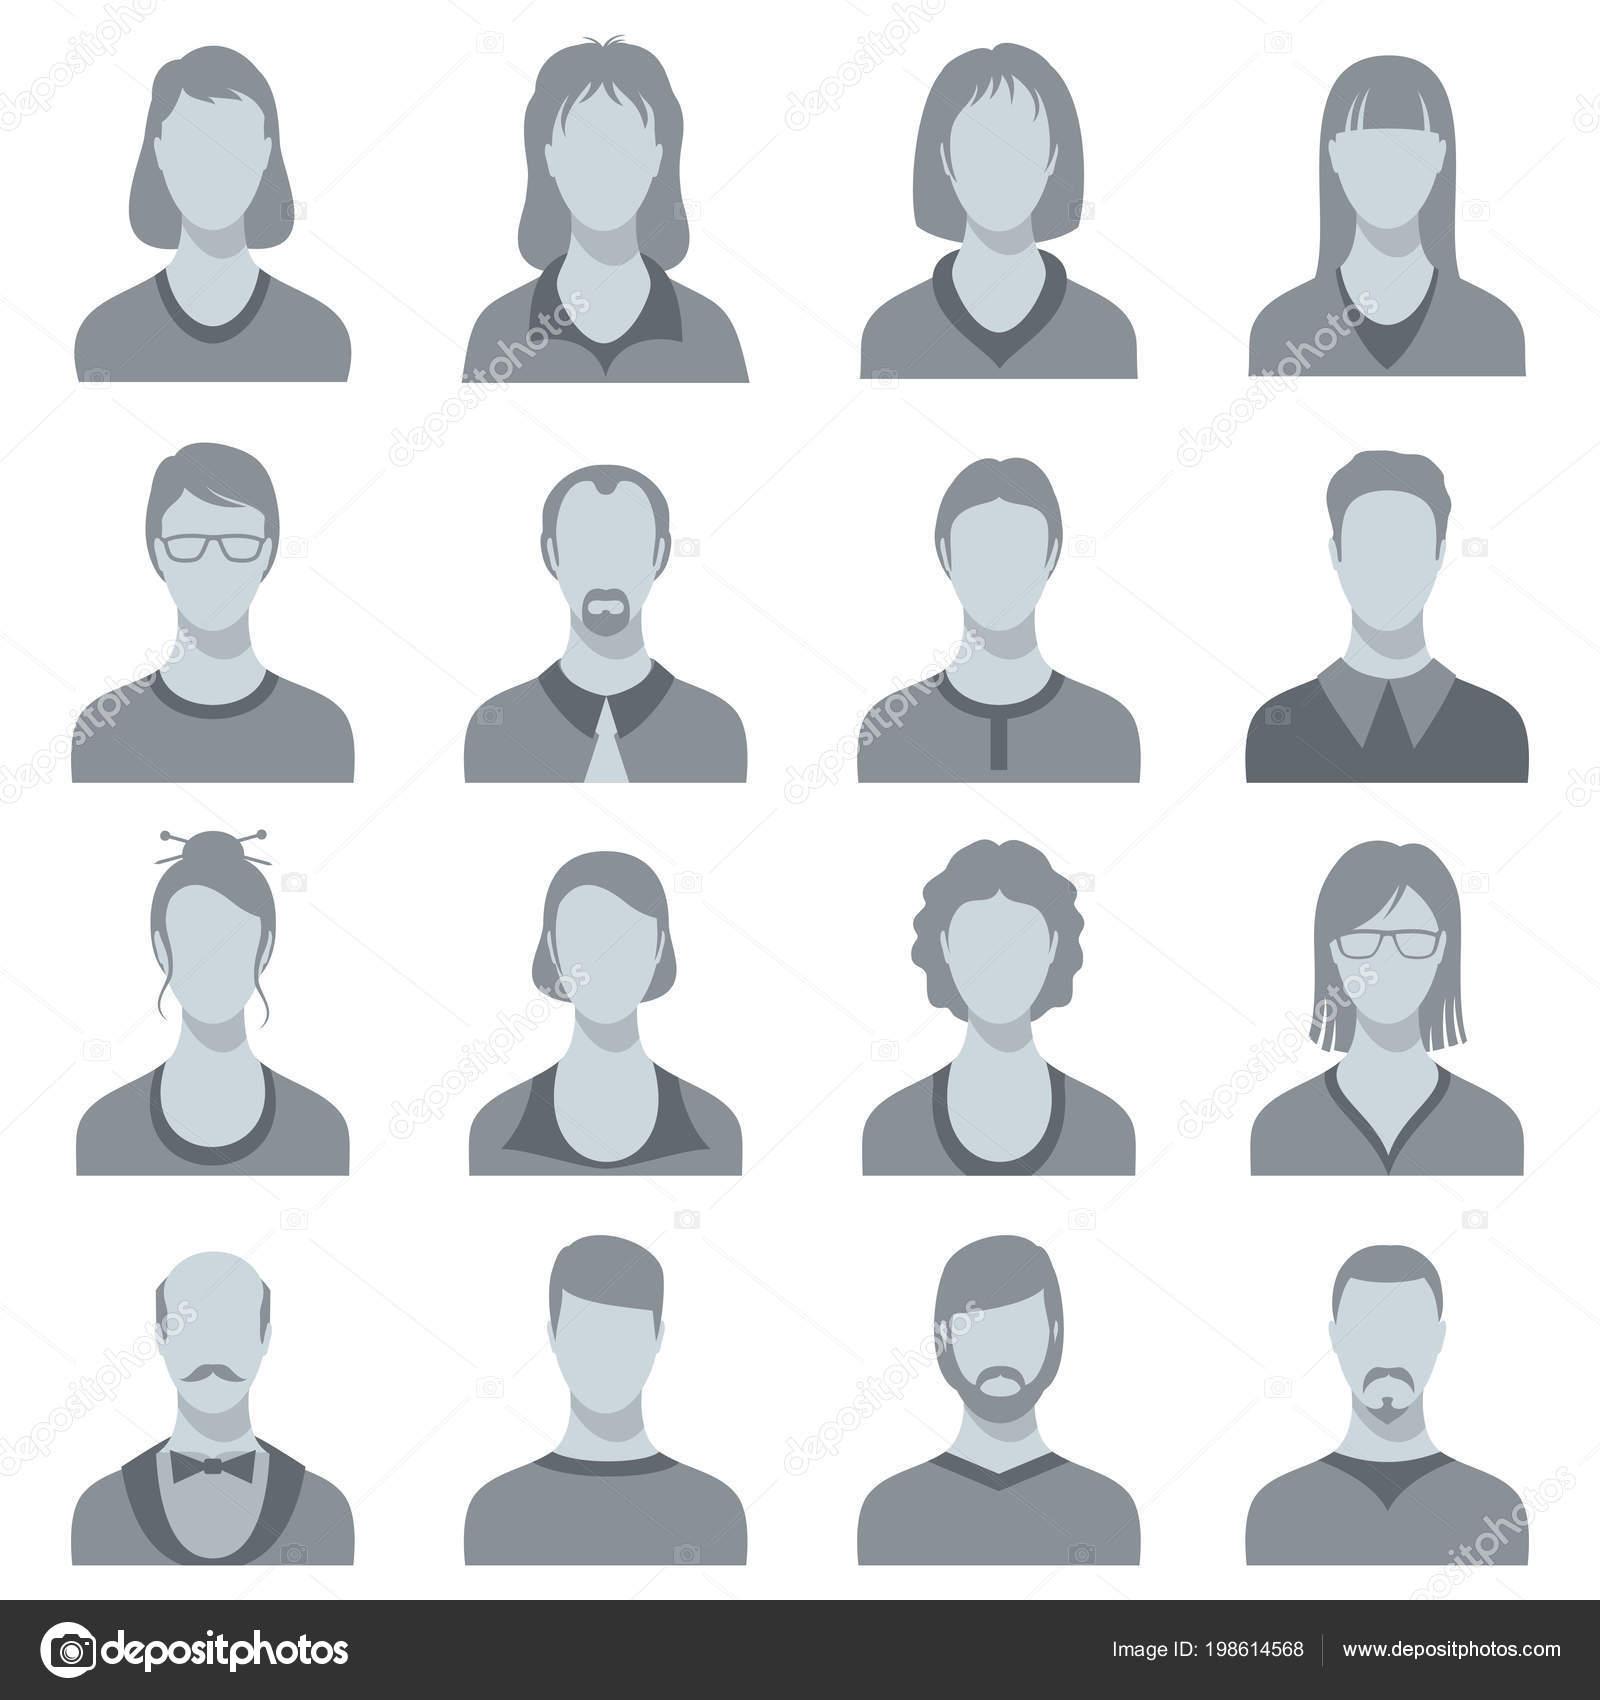 female and male head vector silhouettes user profile avatars